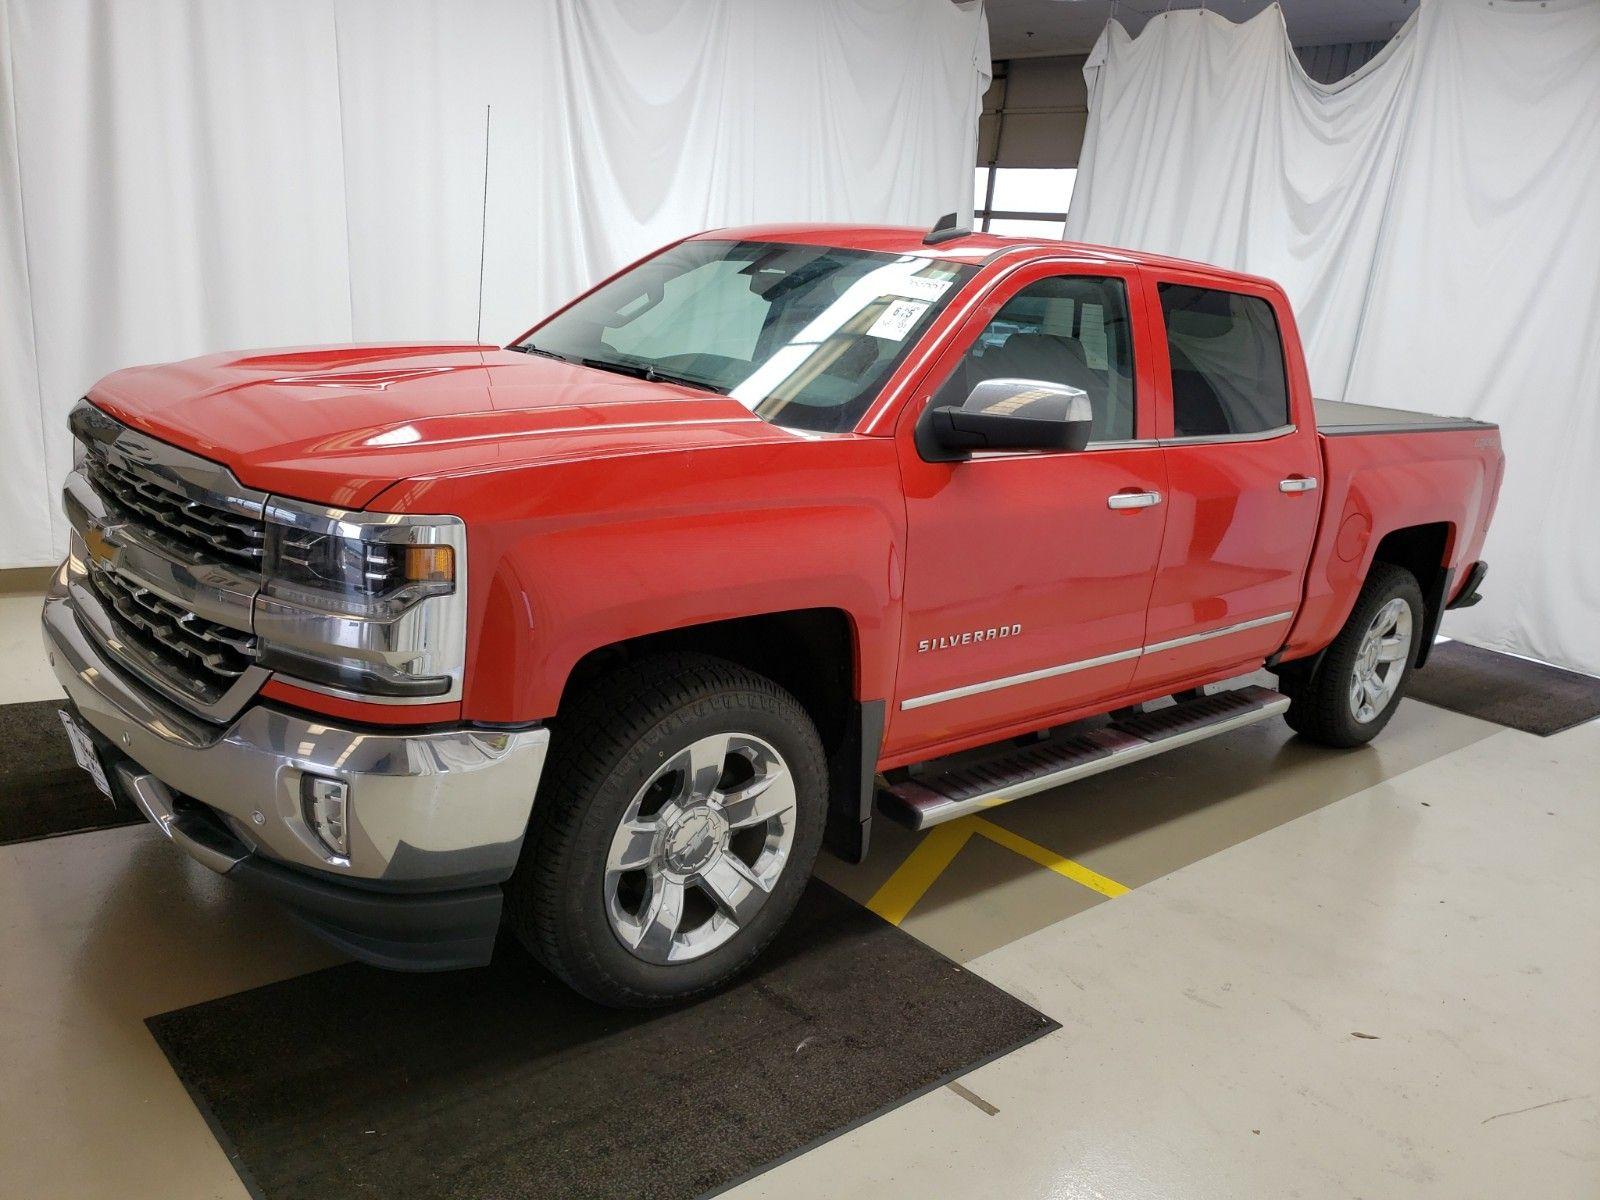 2016 Chevrolet Silverado 5.3. Lot 99913917303 Vin 3GCUKSEC9GG156036